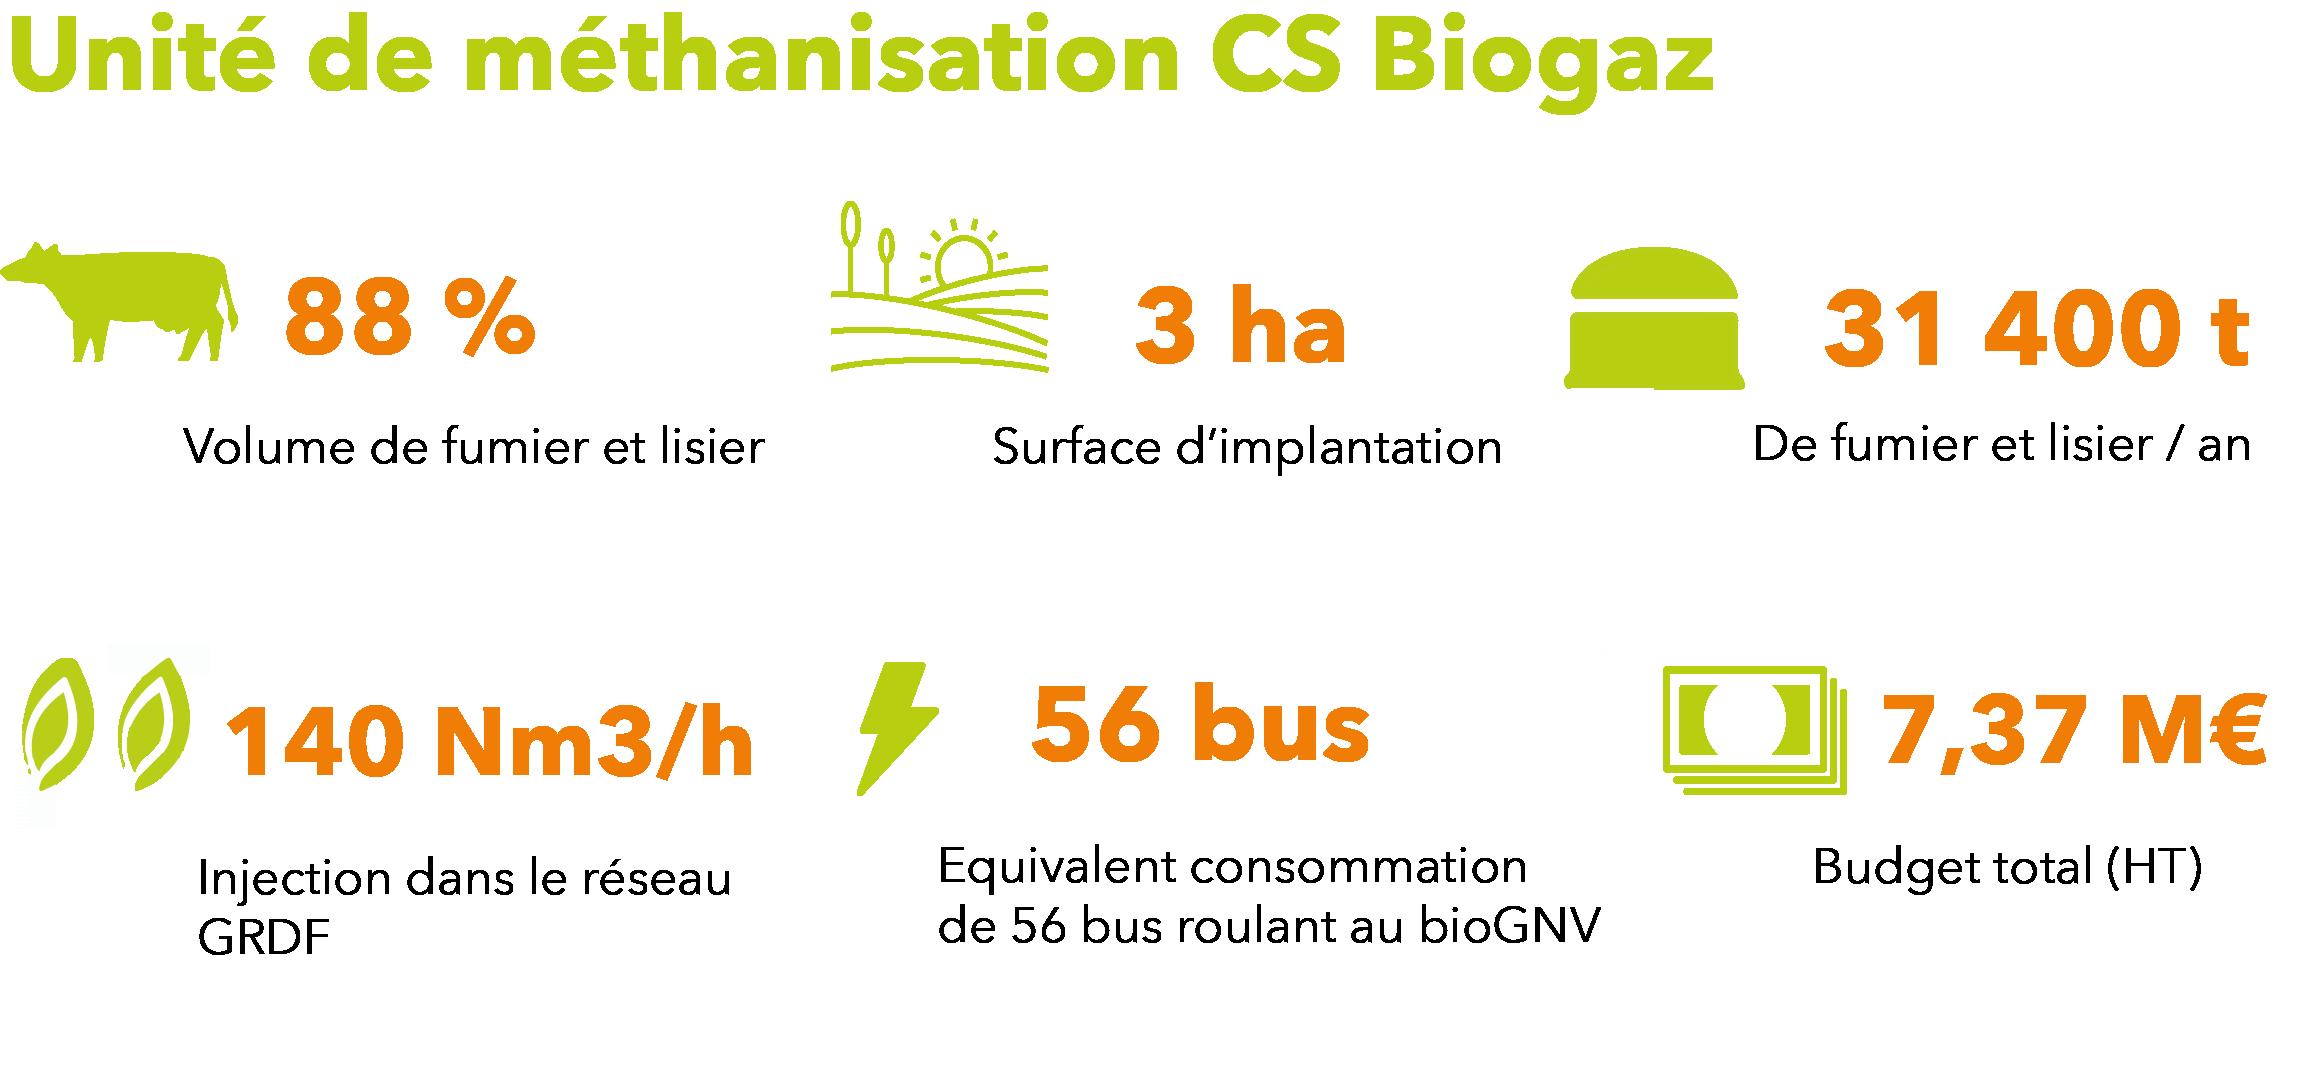 Visuel cs biogaz 5